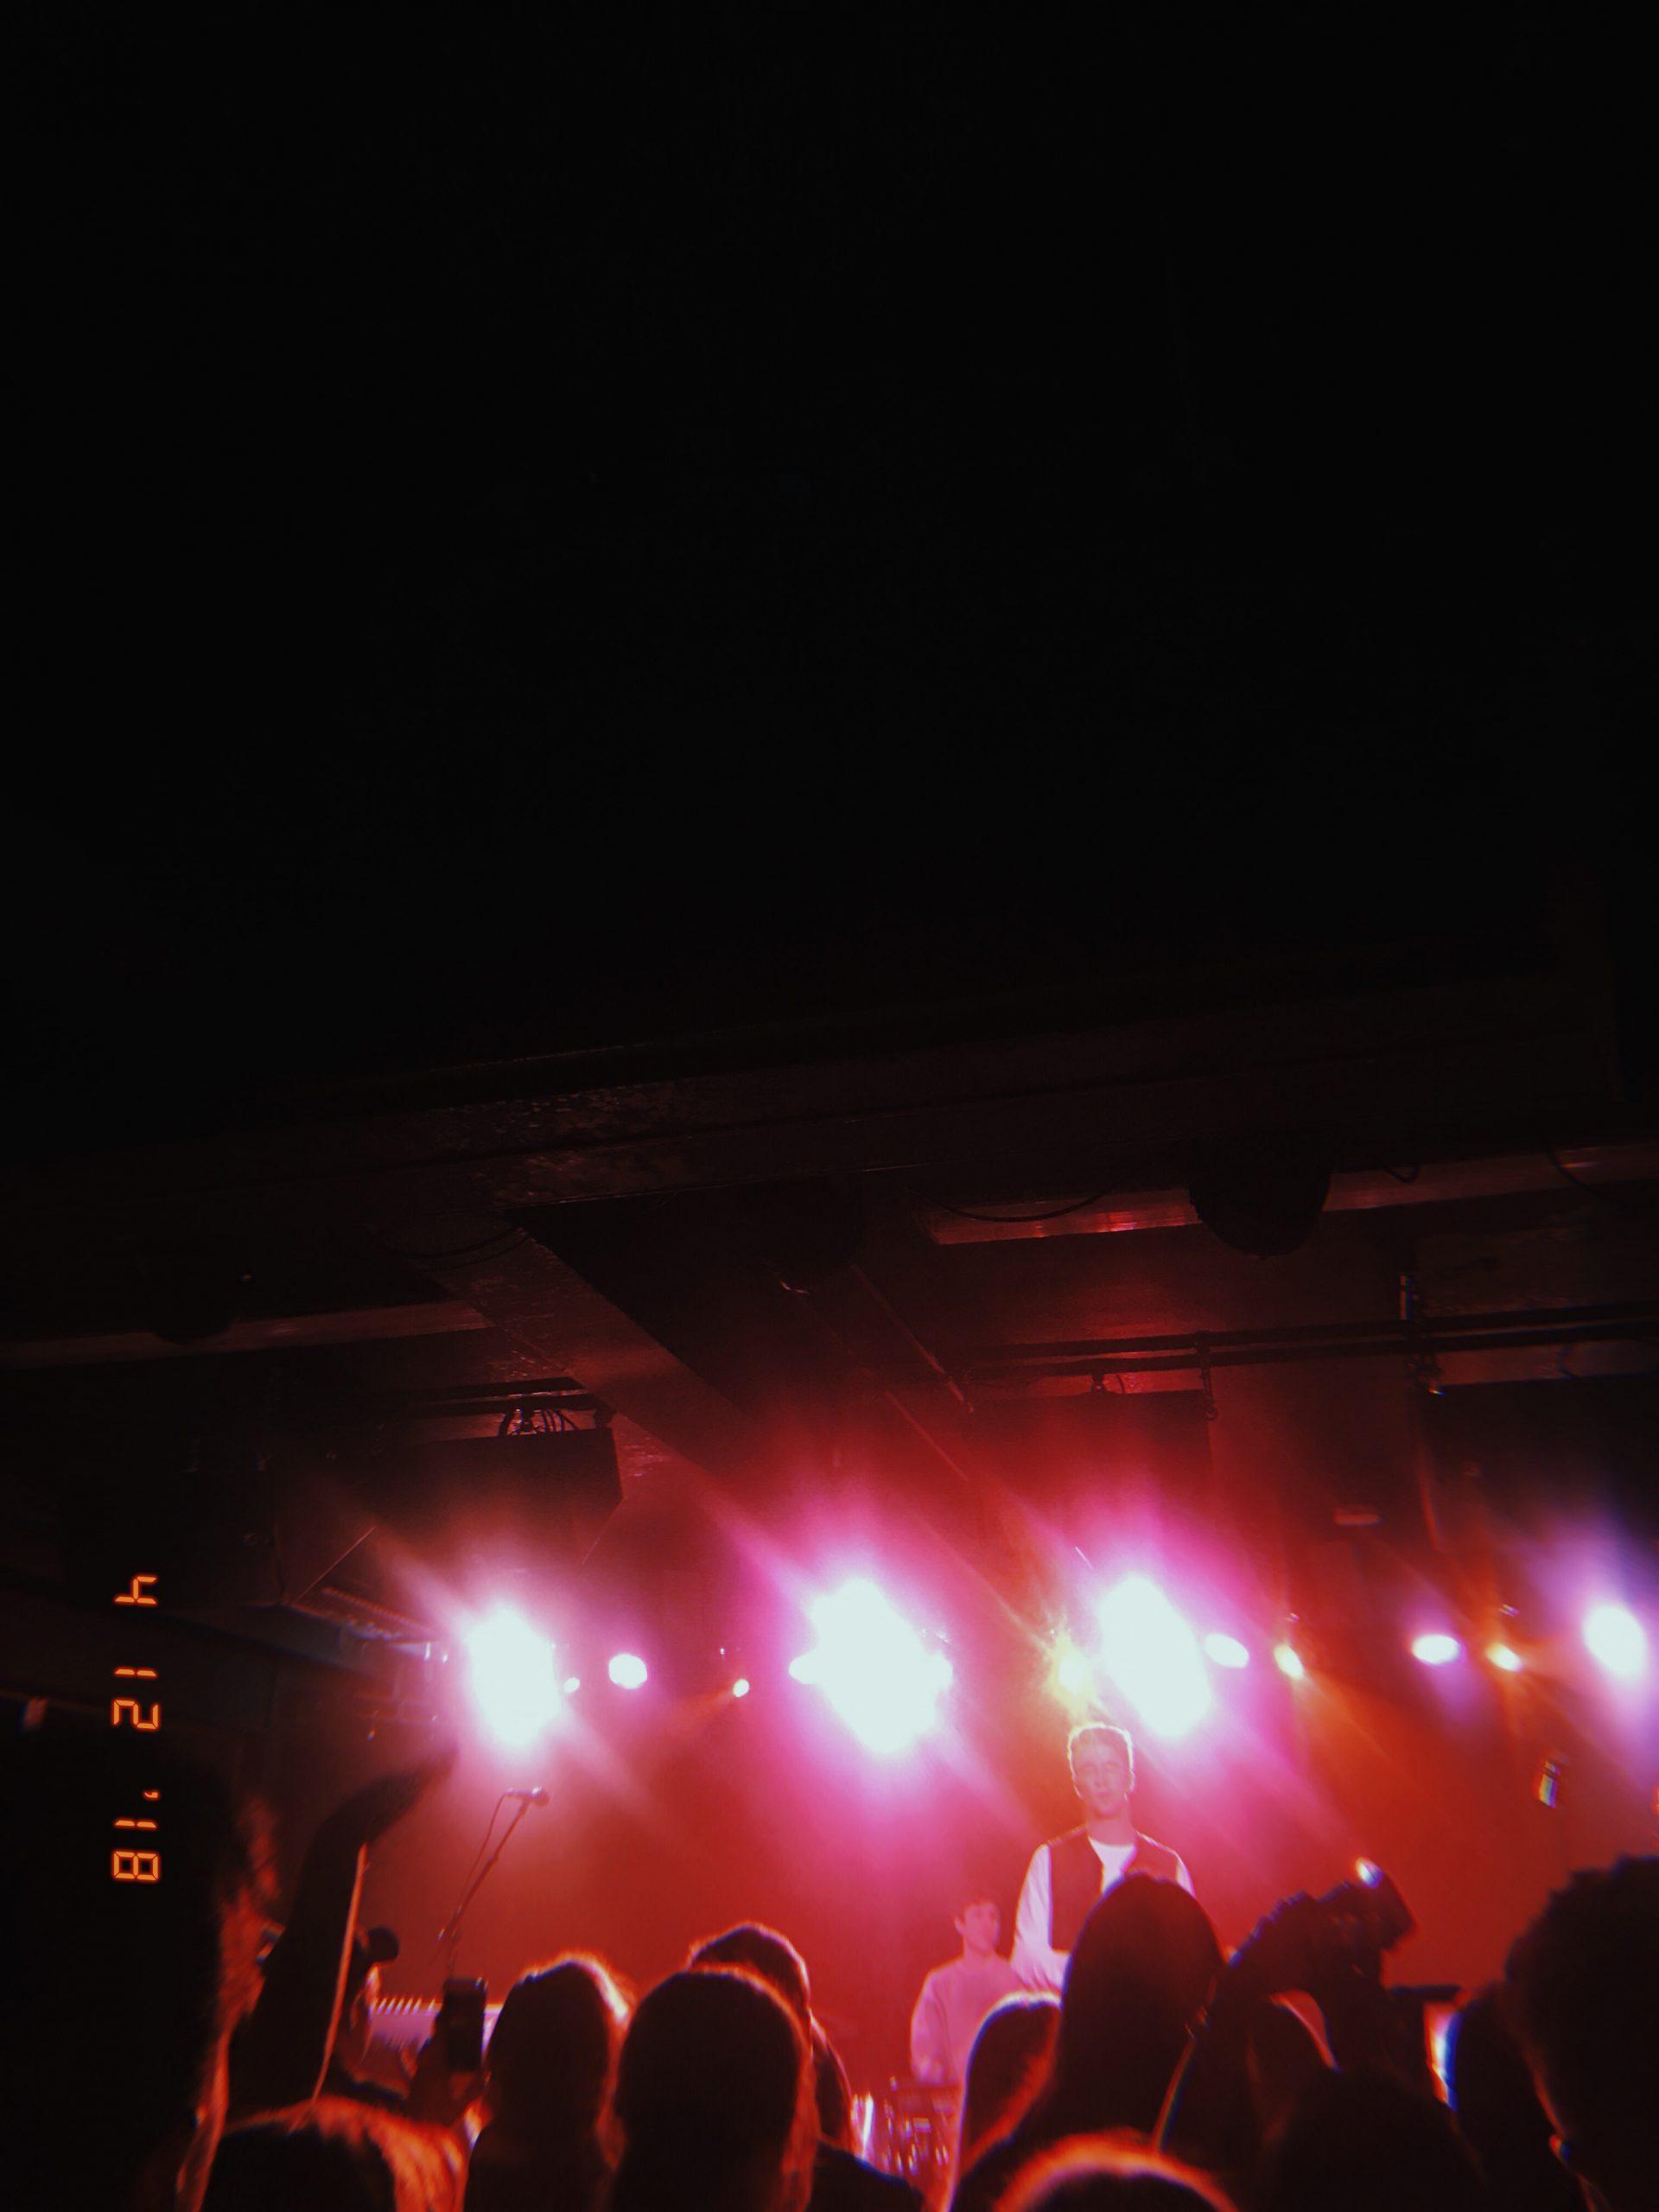 sg lewis concert gig manchester london concert times aura dusk dawn warm